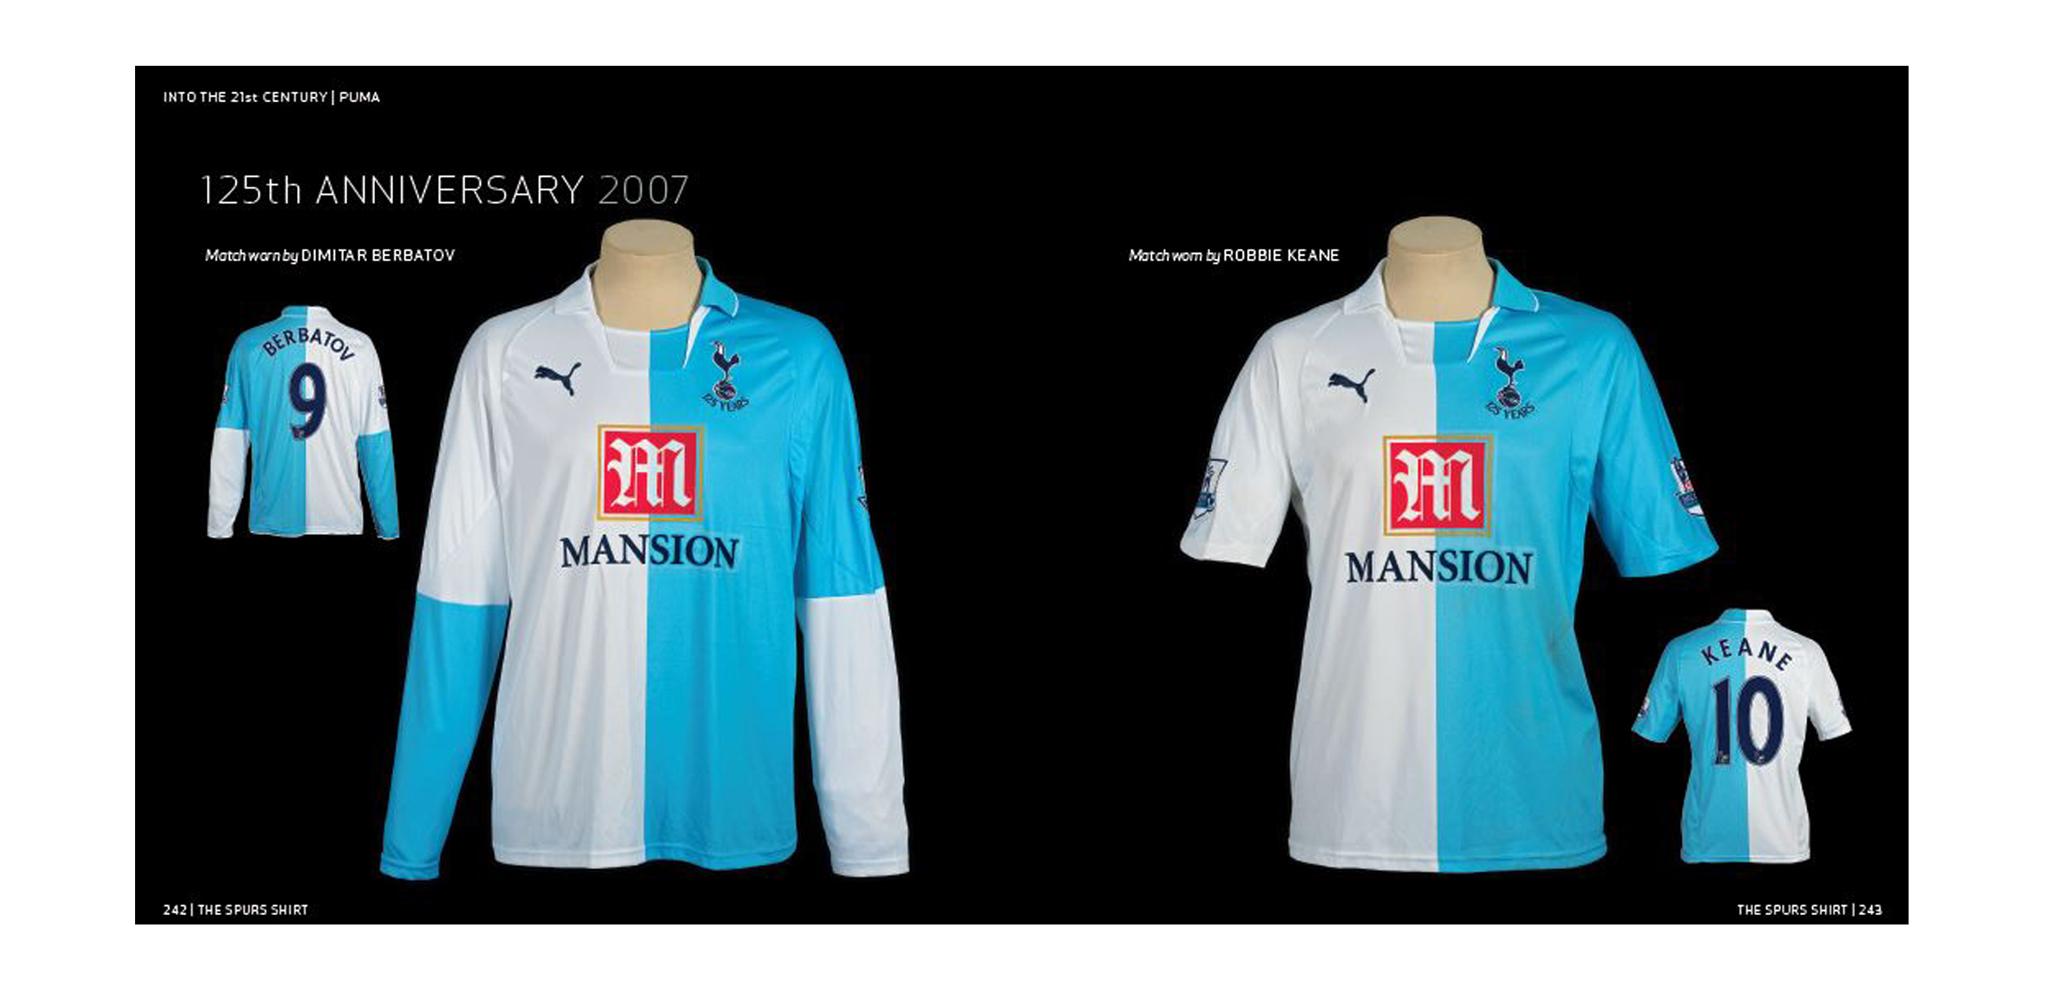 6e2559c5983  The Spurs Shirt  launches